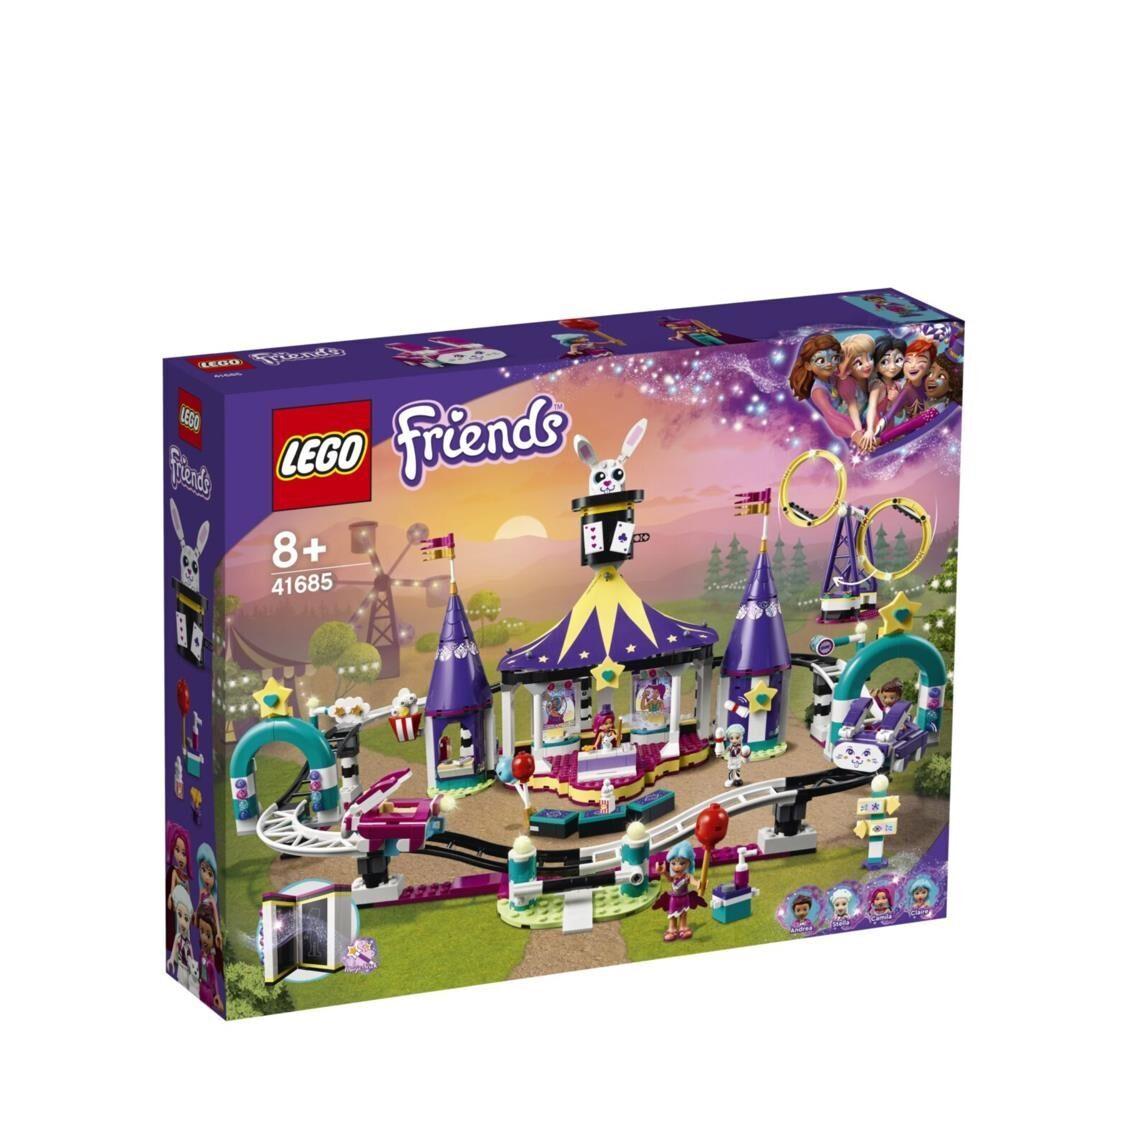 LEGO Friends - Magical Funfair Roller Coaster 41685